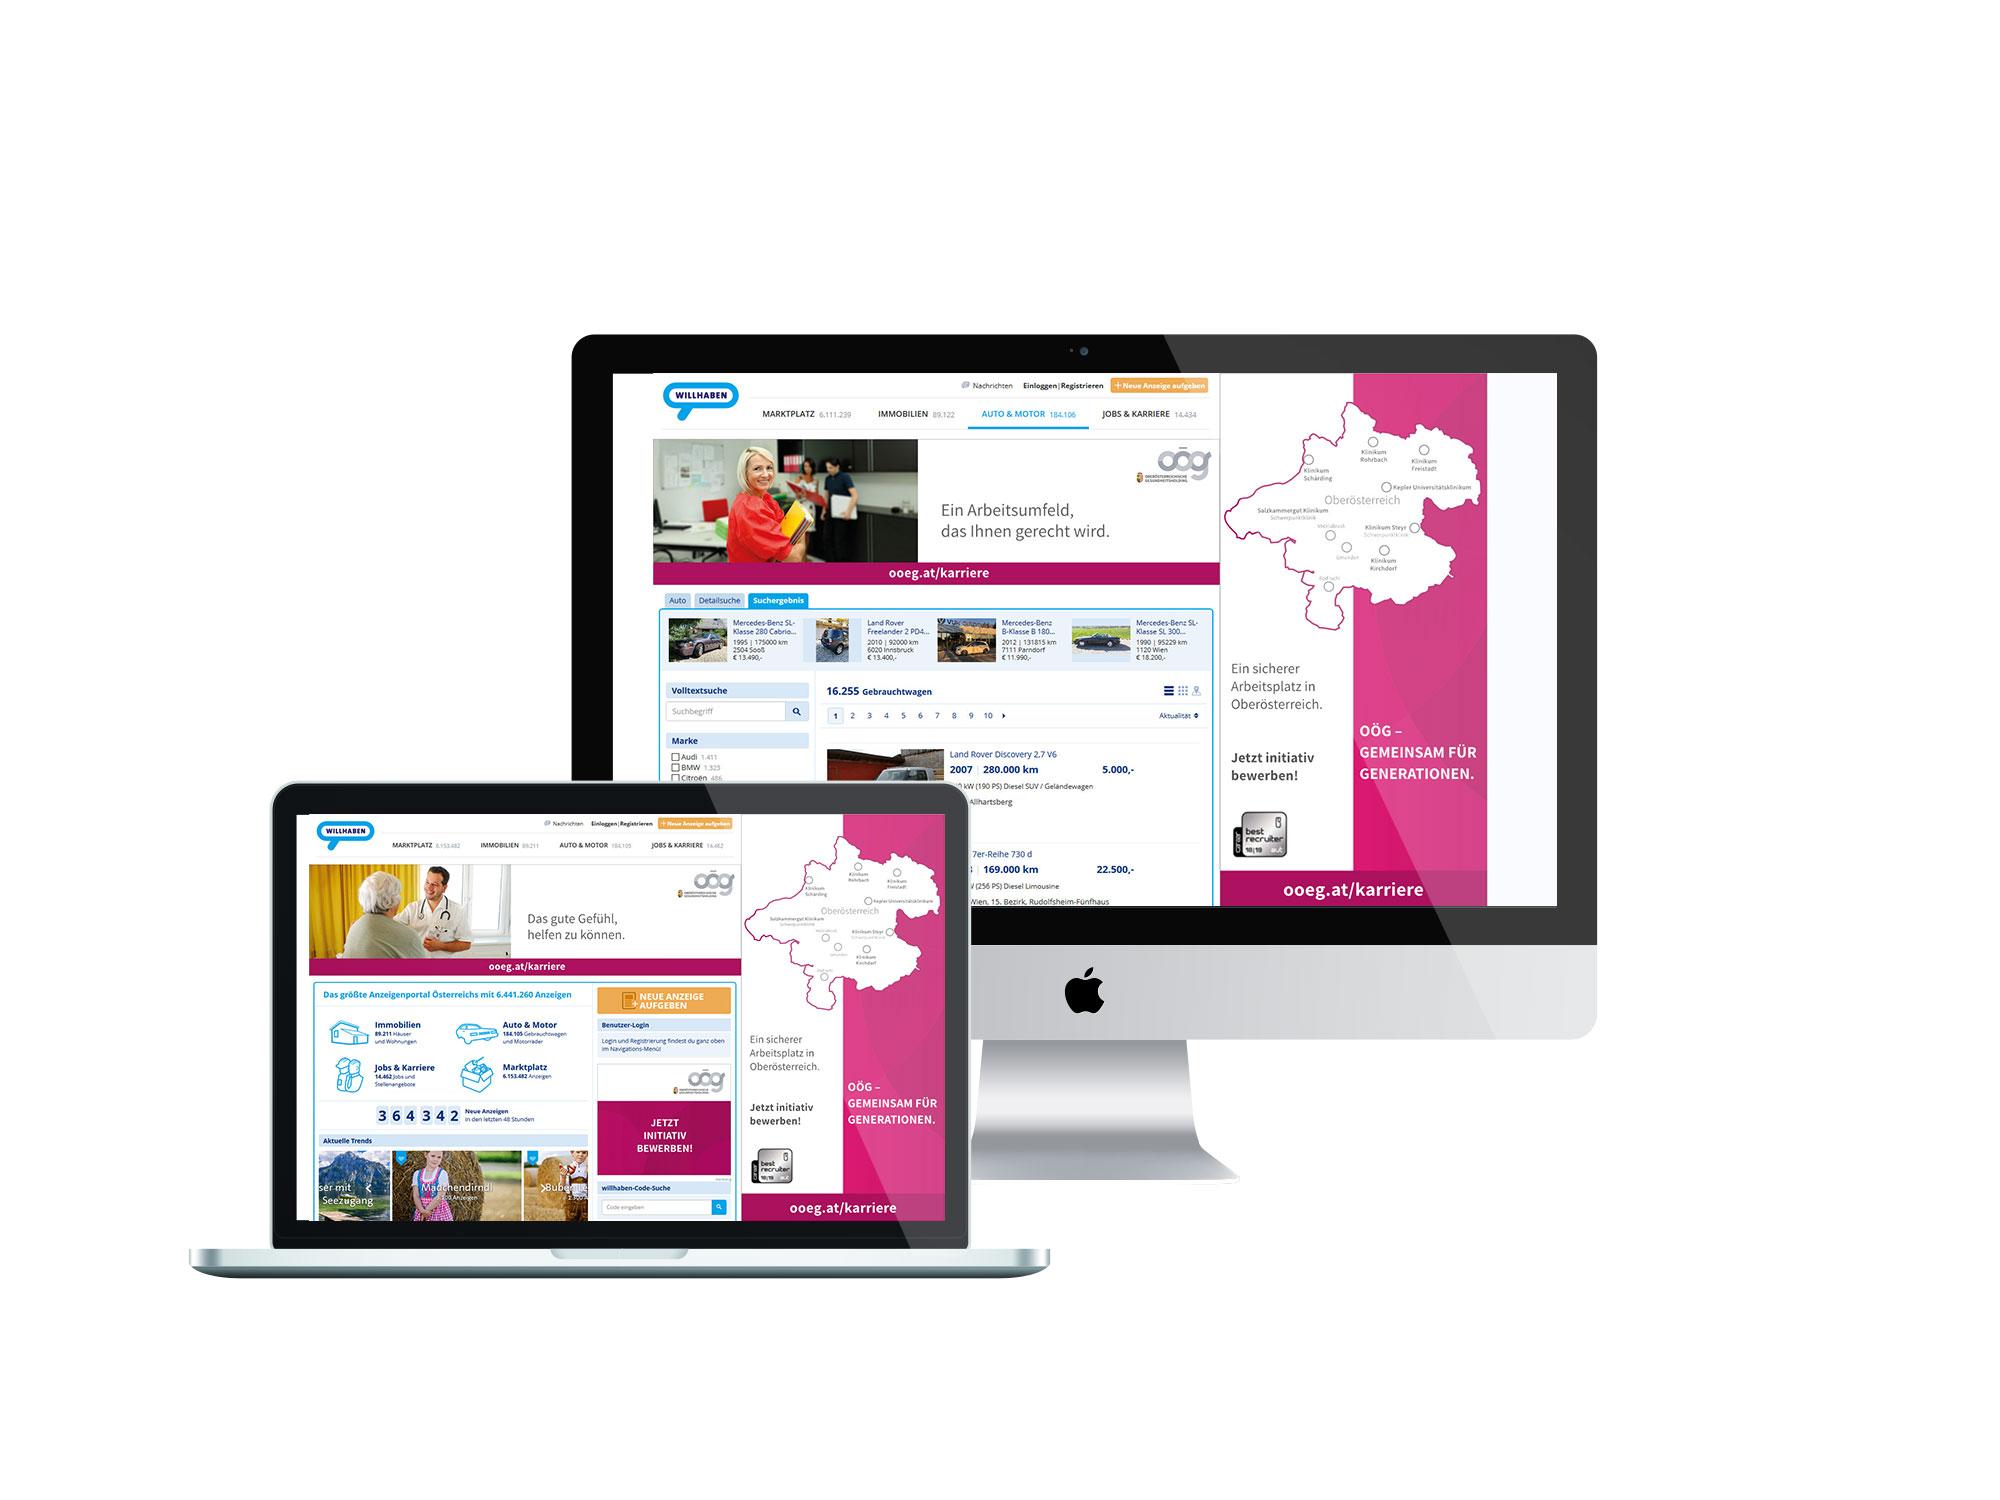 OOEG Full Site Branding willhaben.at